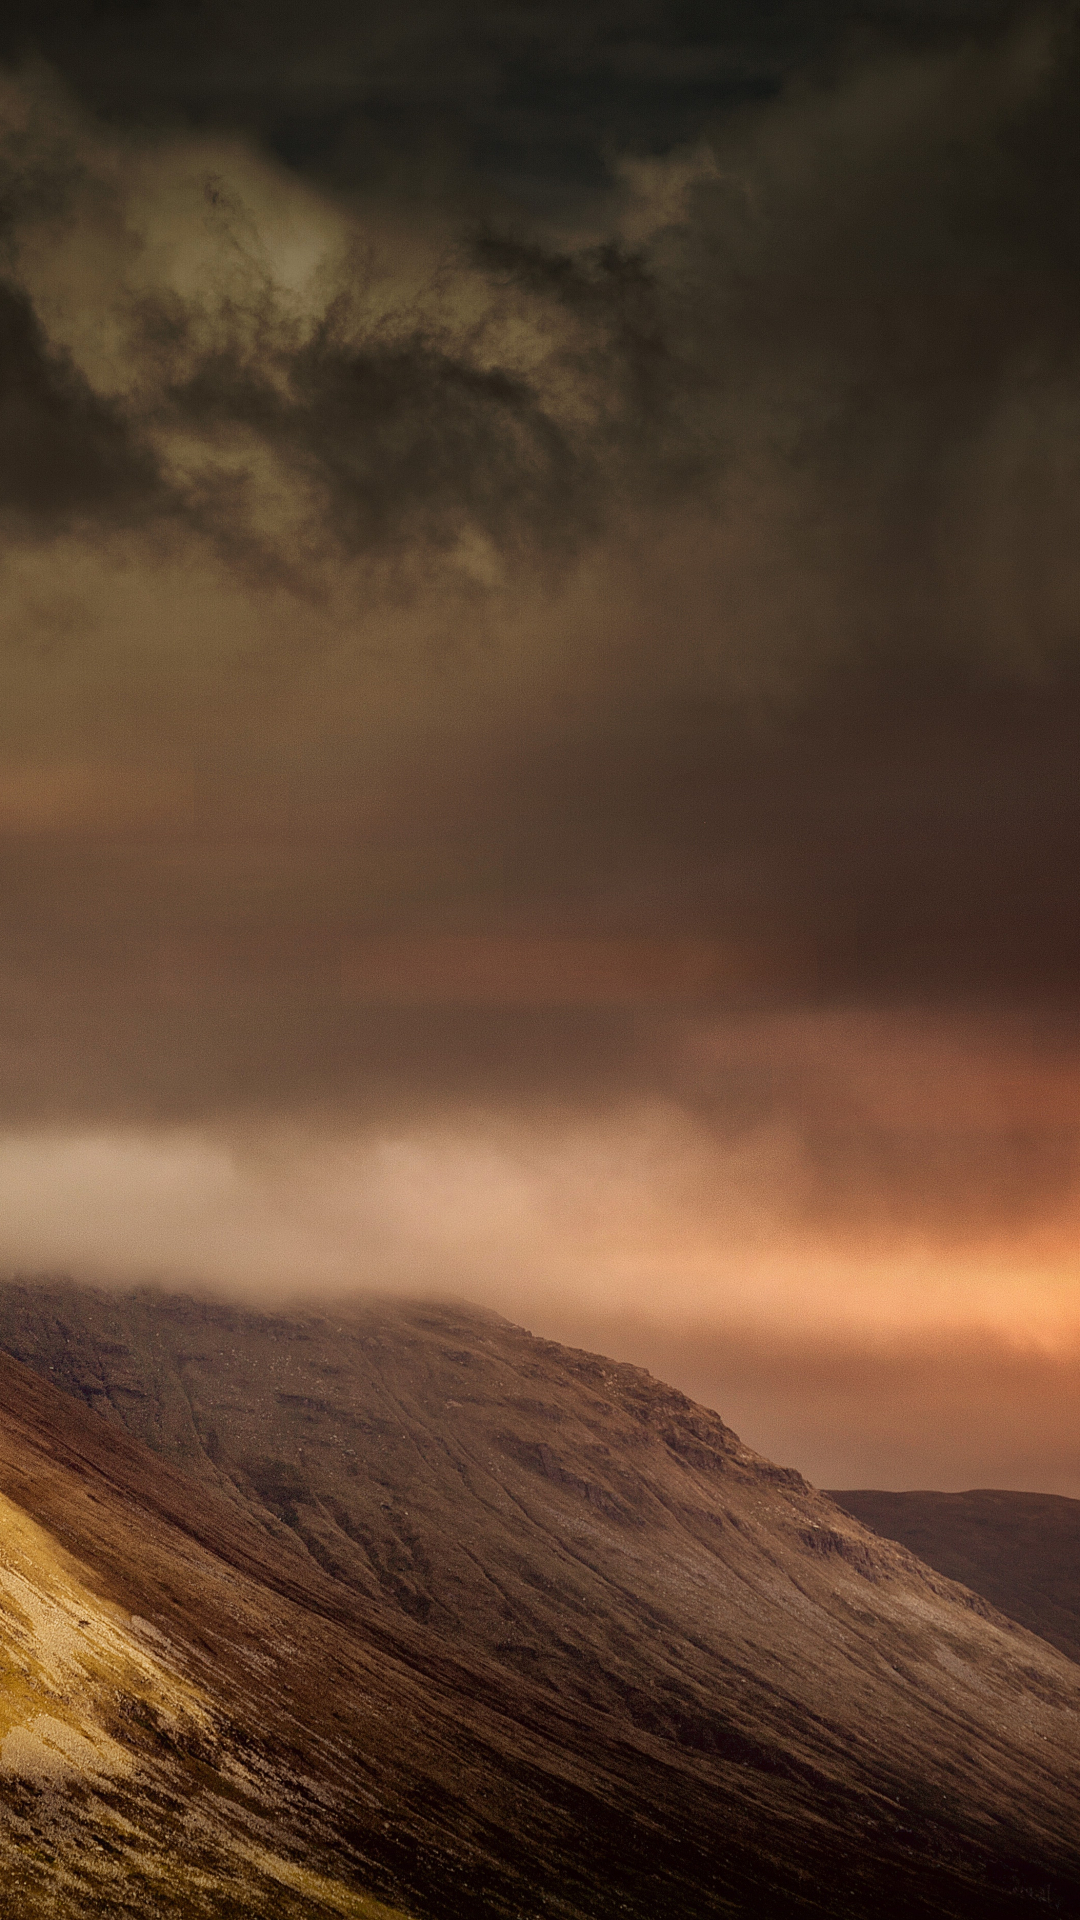 Mountain, Highland, Cloudy iPhone Wallpaper